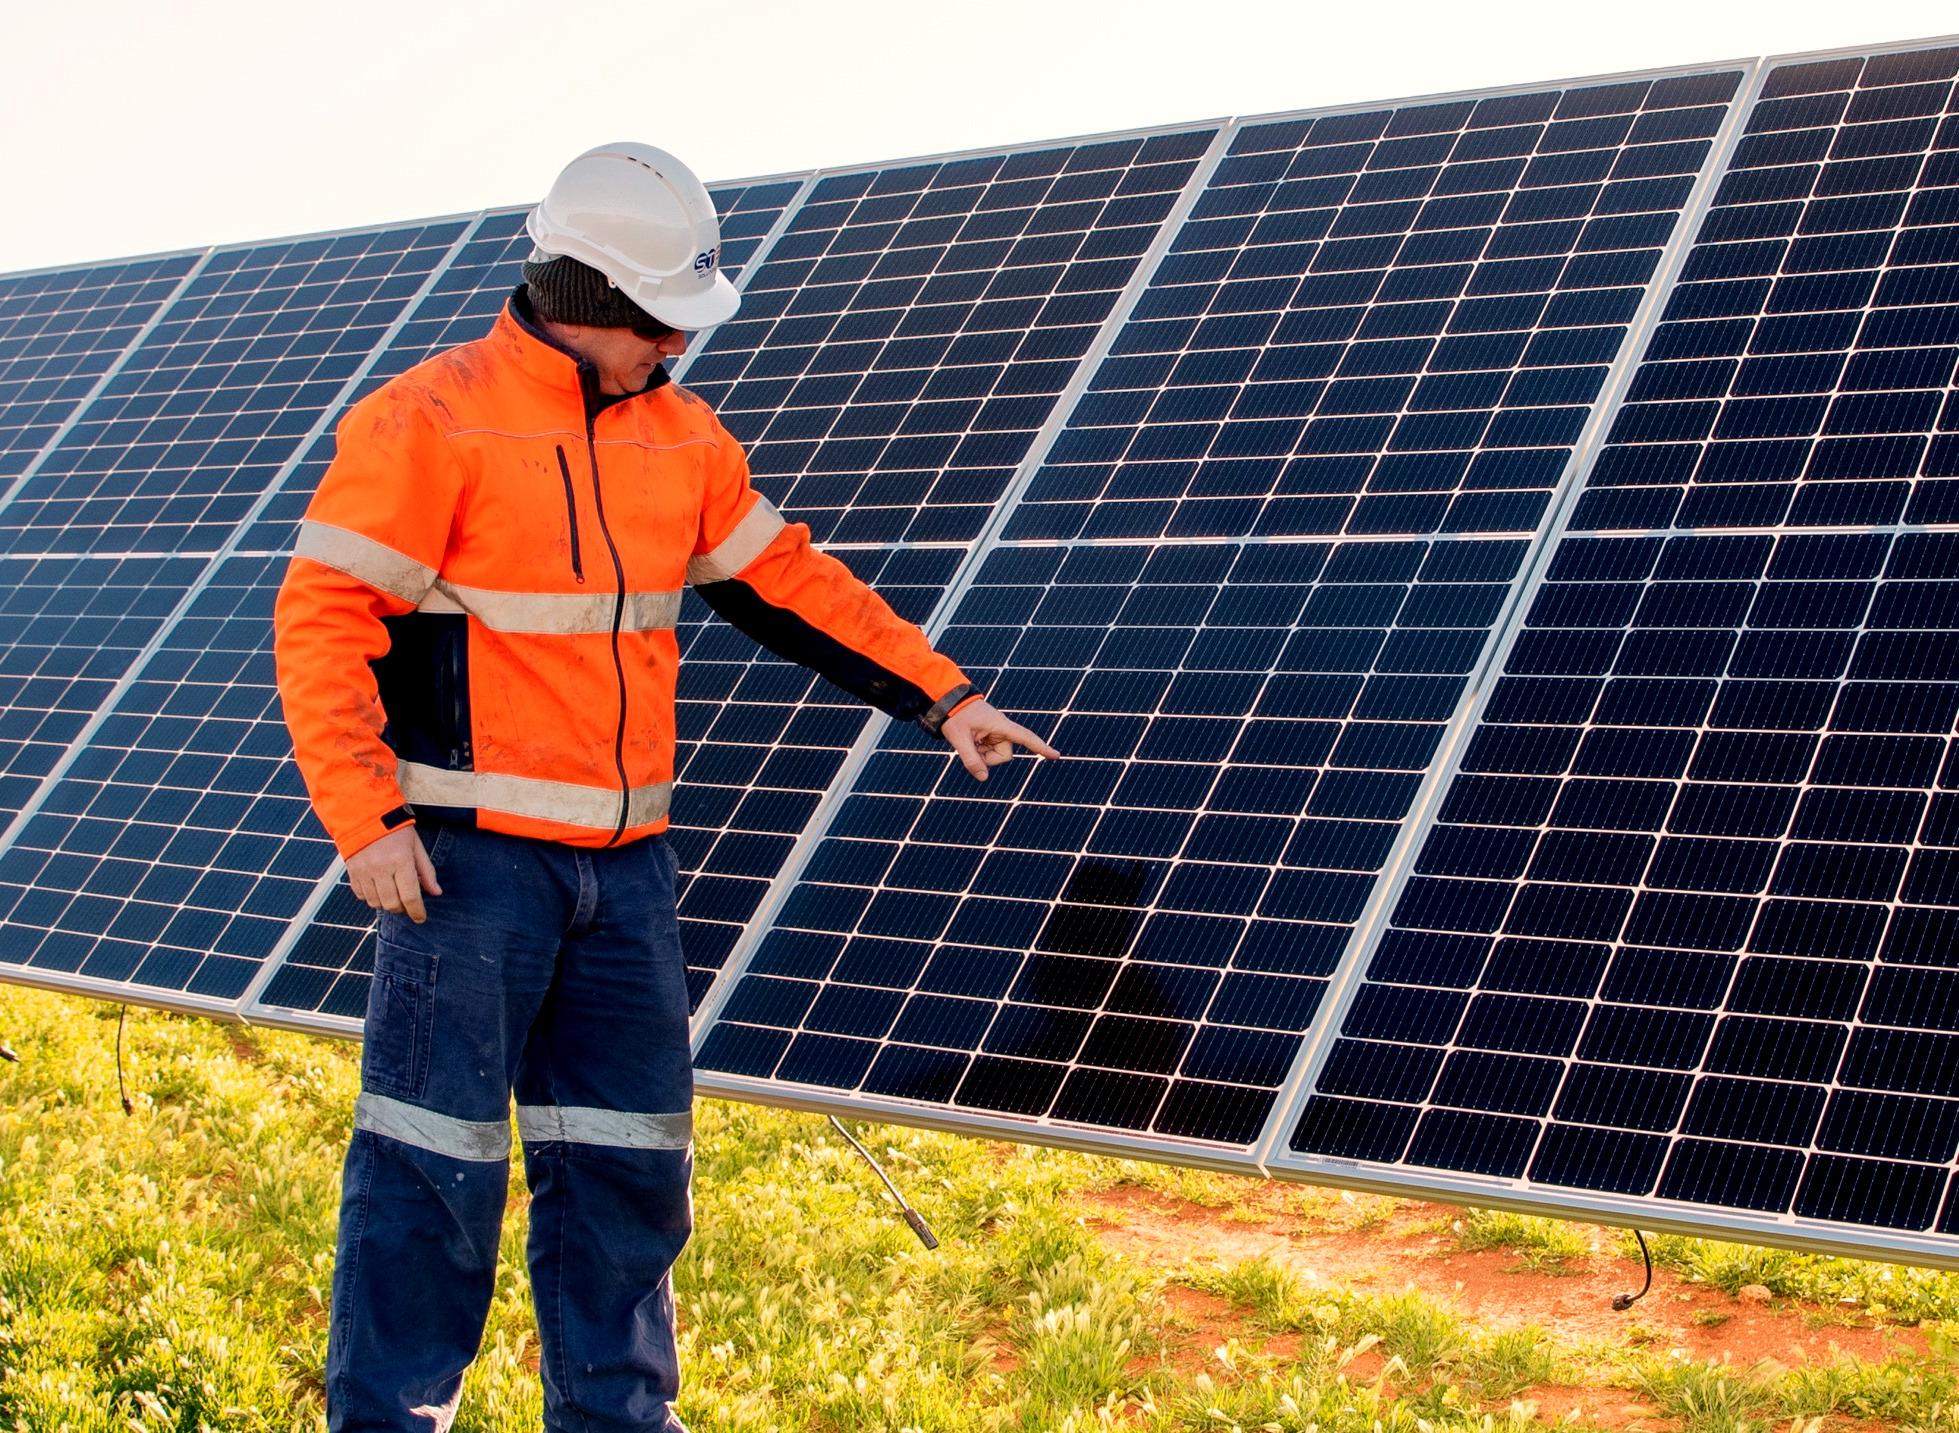 Mannum Solar Farm